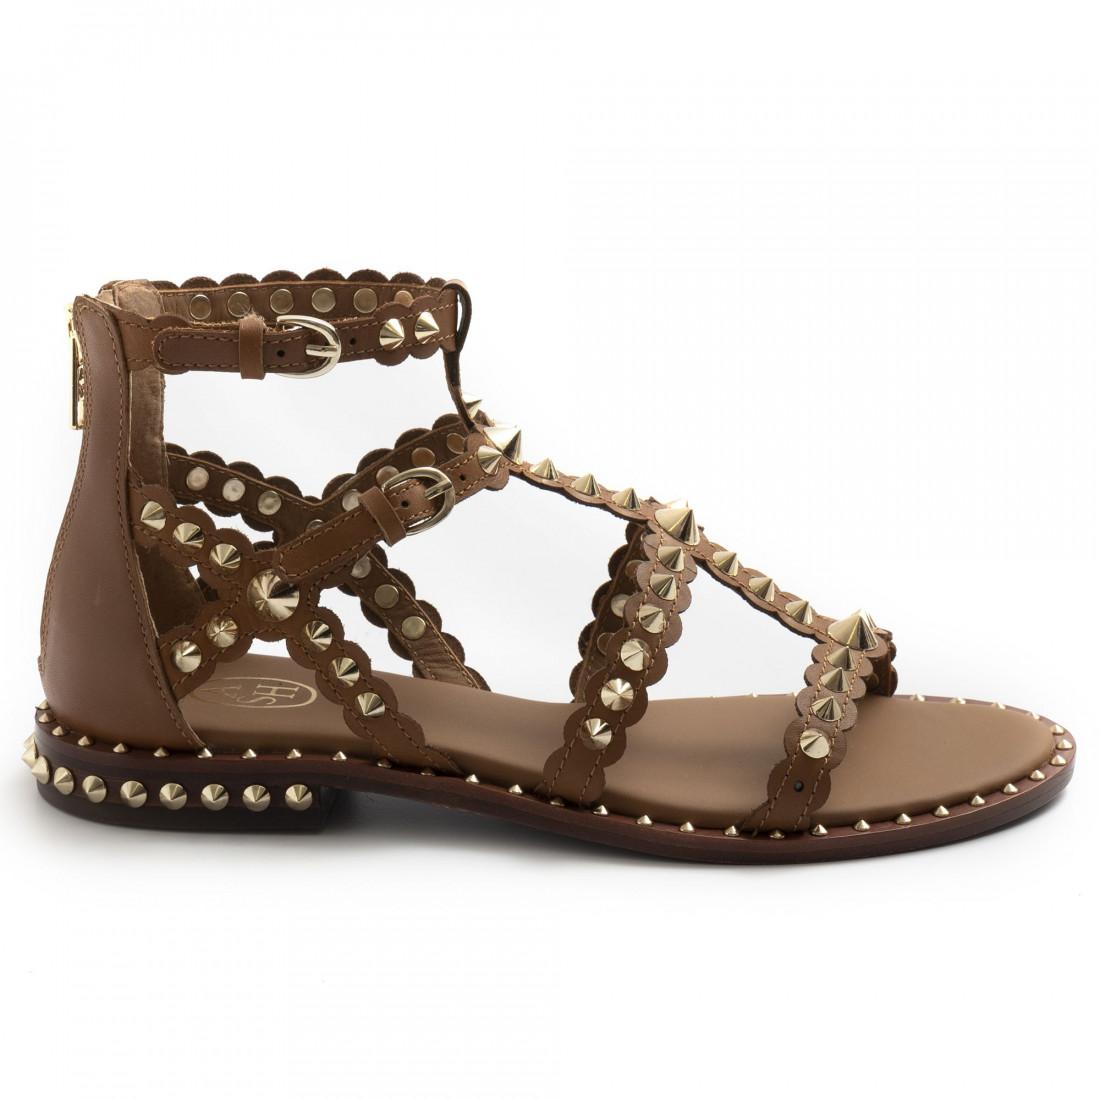 sandals woman ash pixel02 8694